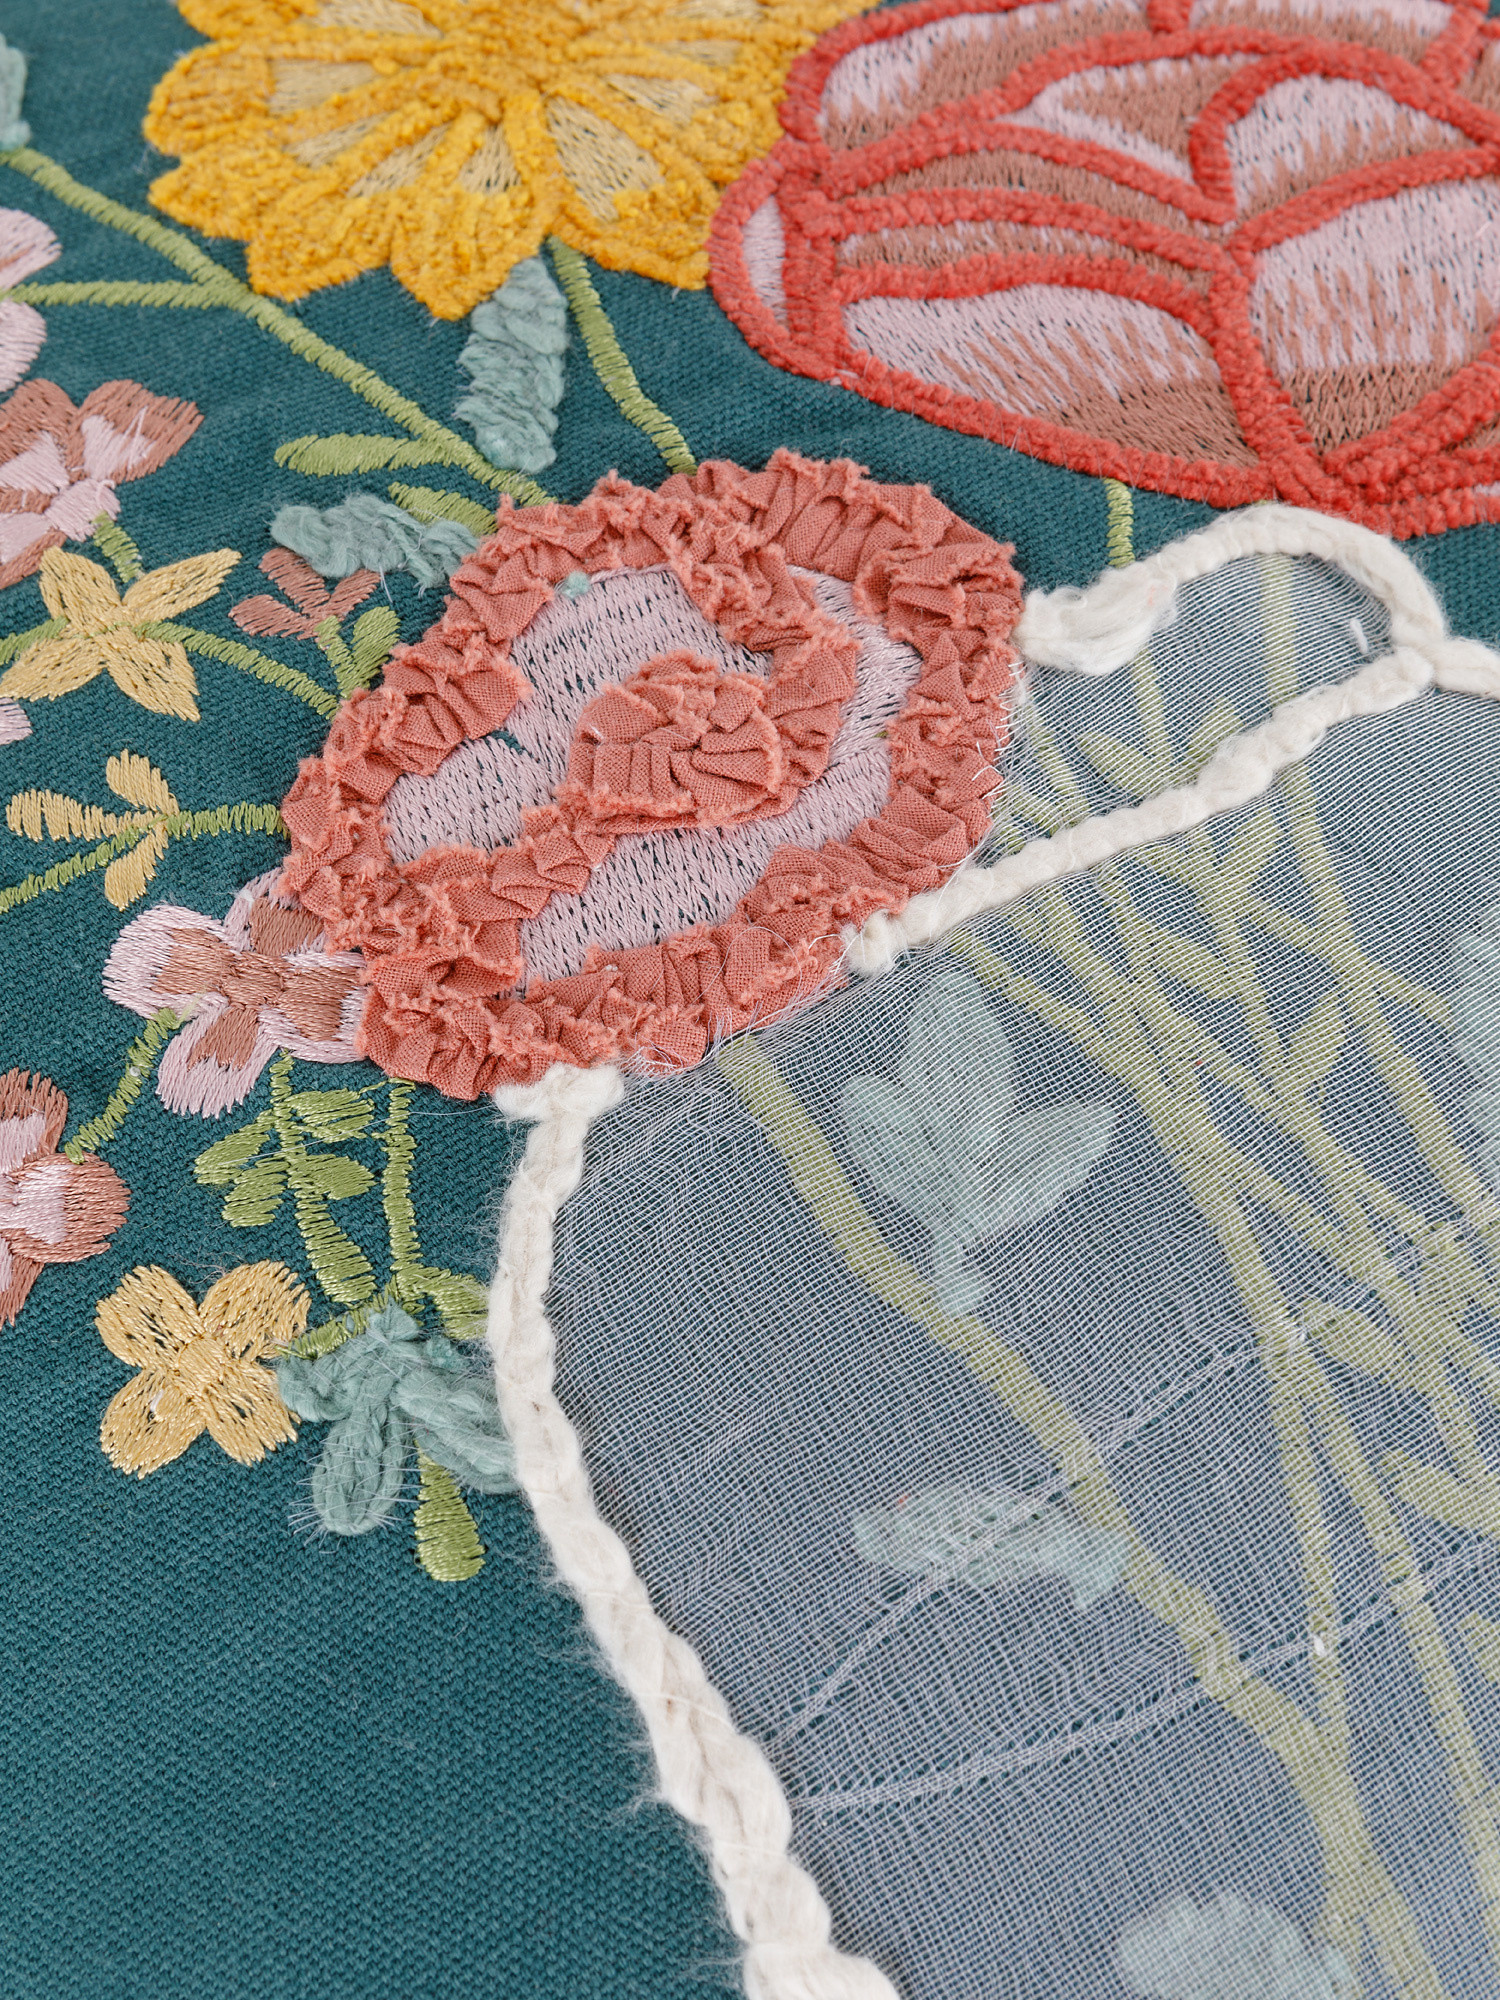 Cuscino cotone ricamo vaso 45x45cm, Multicolor, large image number 2